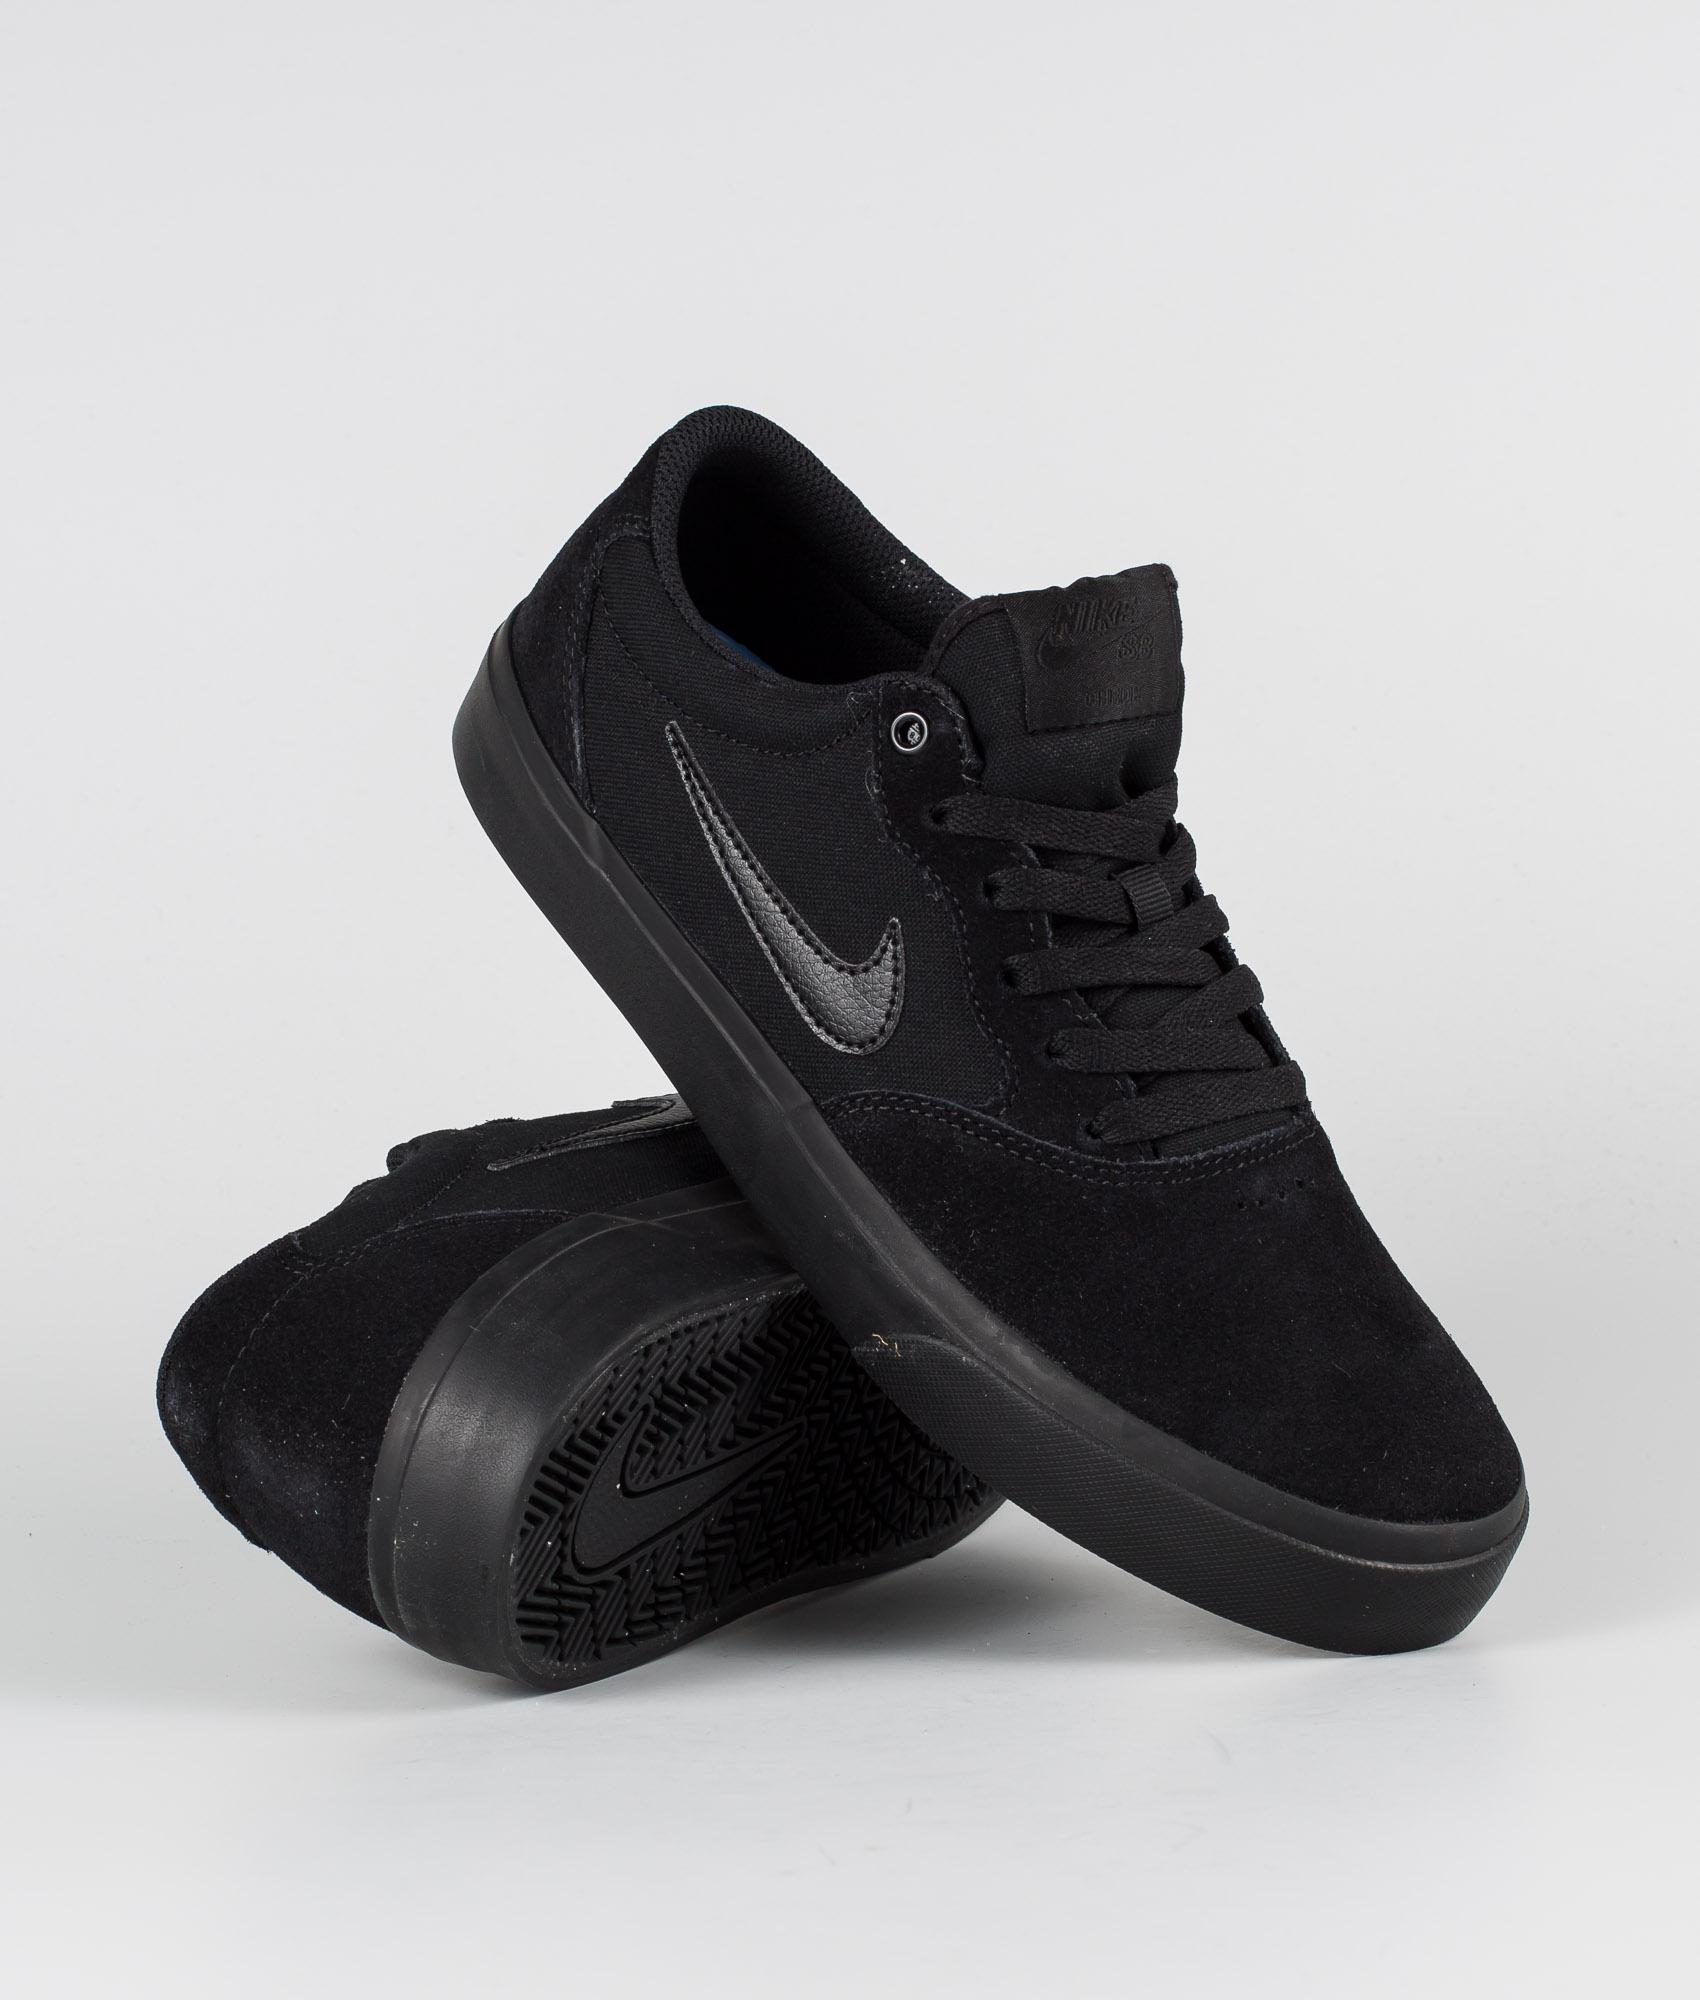 Nike Nike Sb Zoom Blazer Low Gt Sko BlackSail Ridestore.no